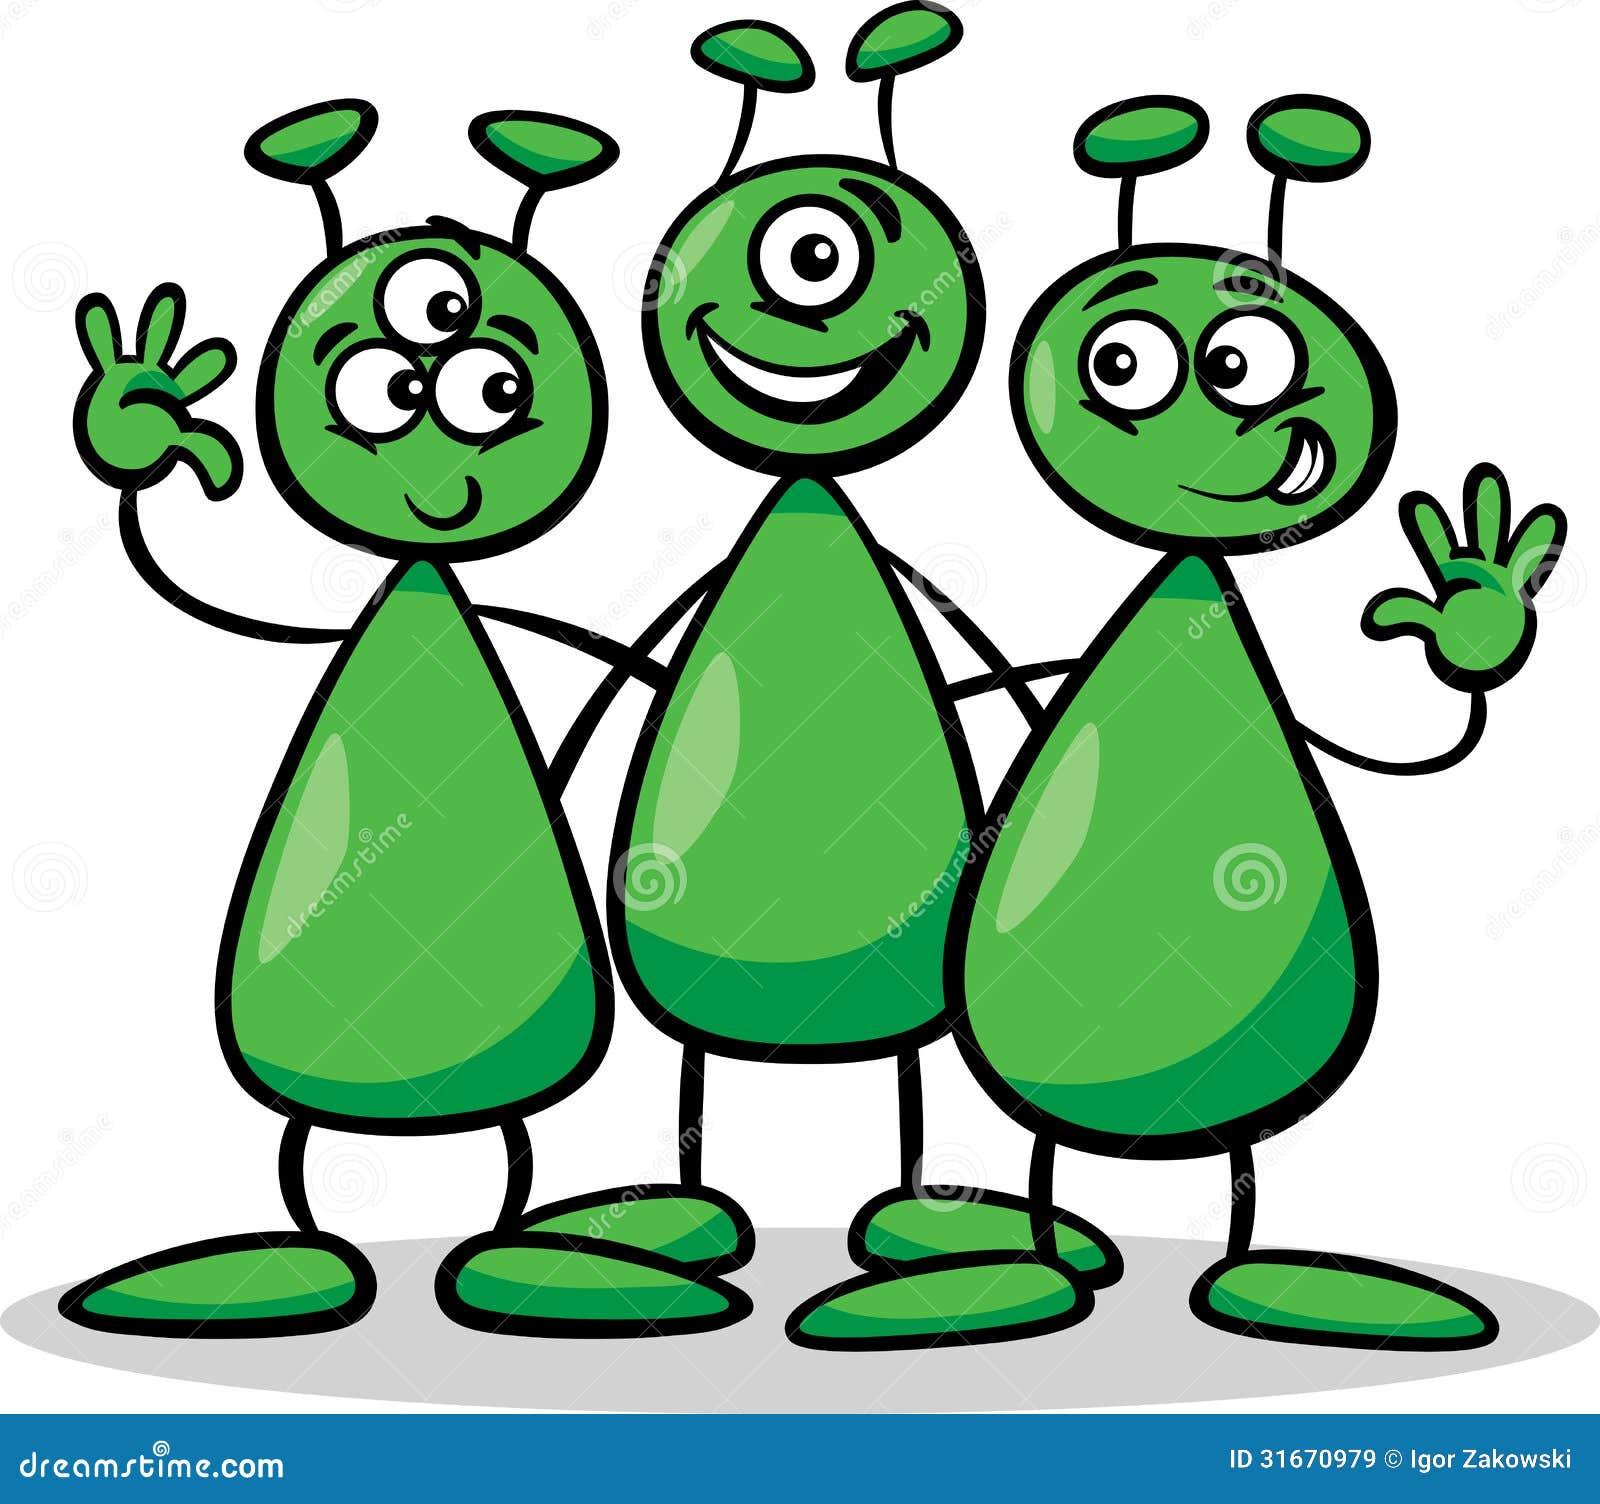 Download Aliens Or Martians Cartoon Illustration Stock Vector